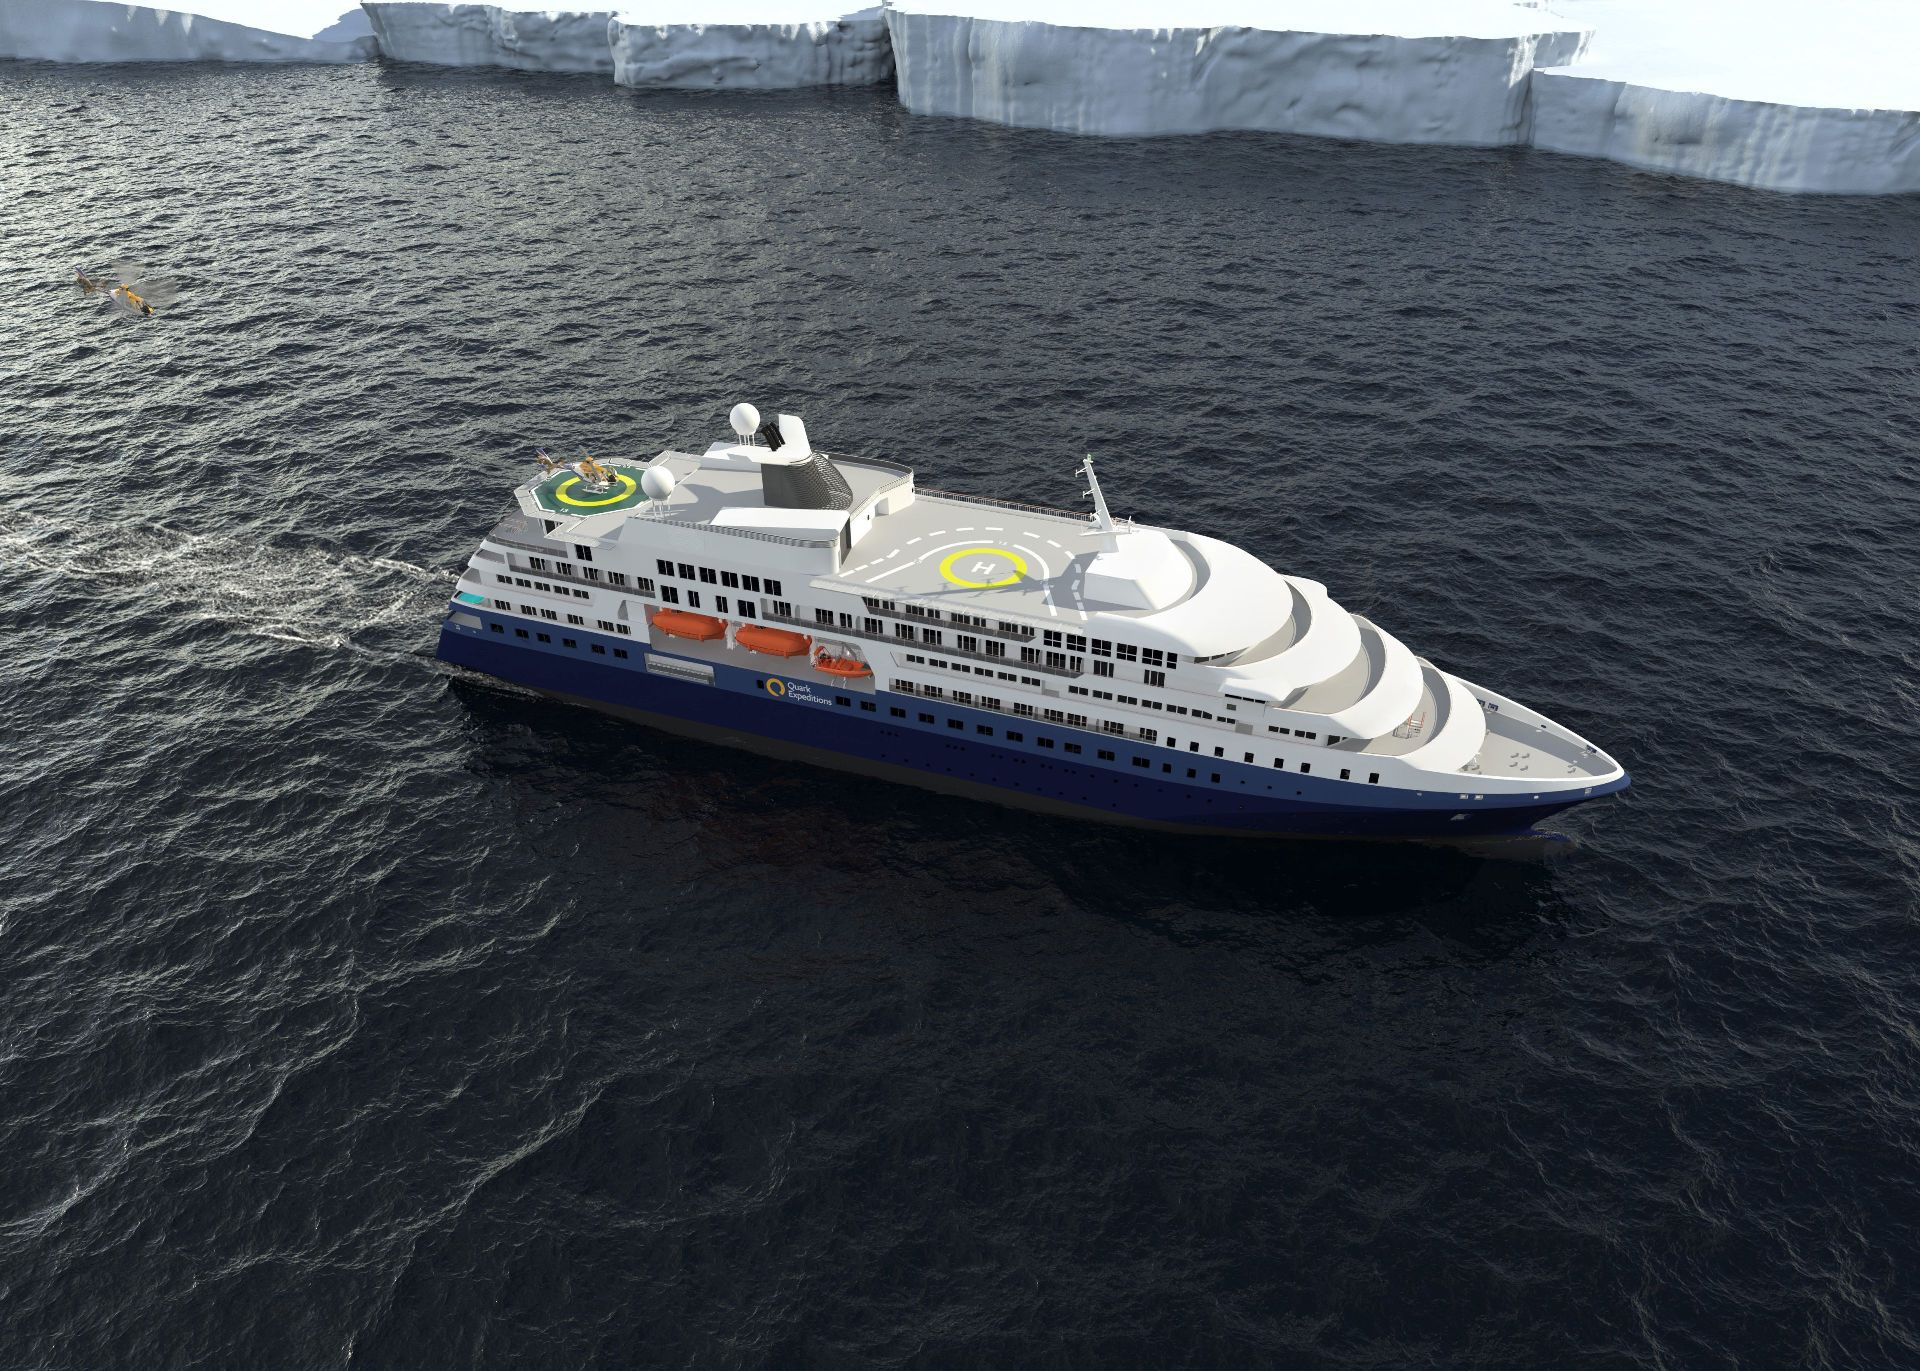 Ilustracija: Kruzer klase Polar Class 6